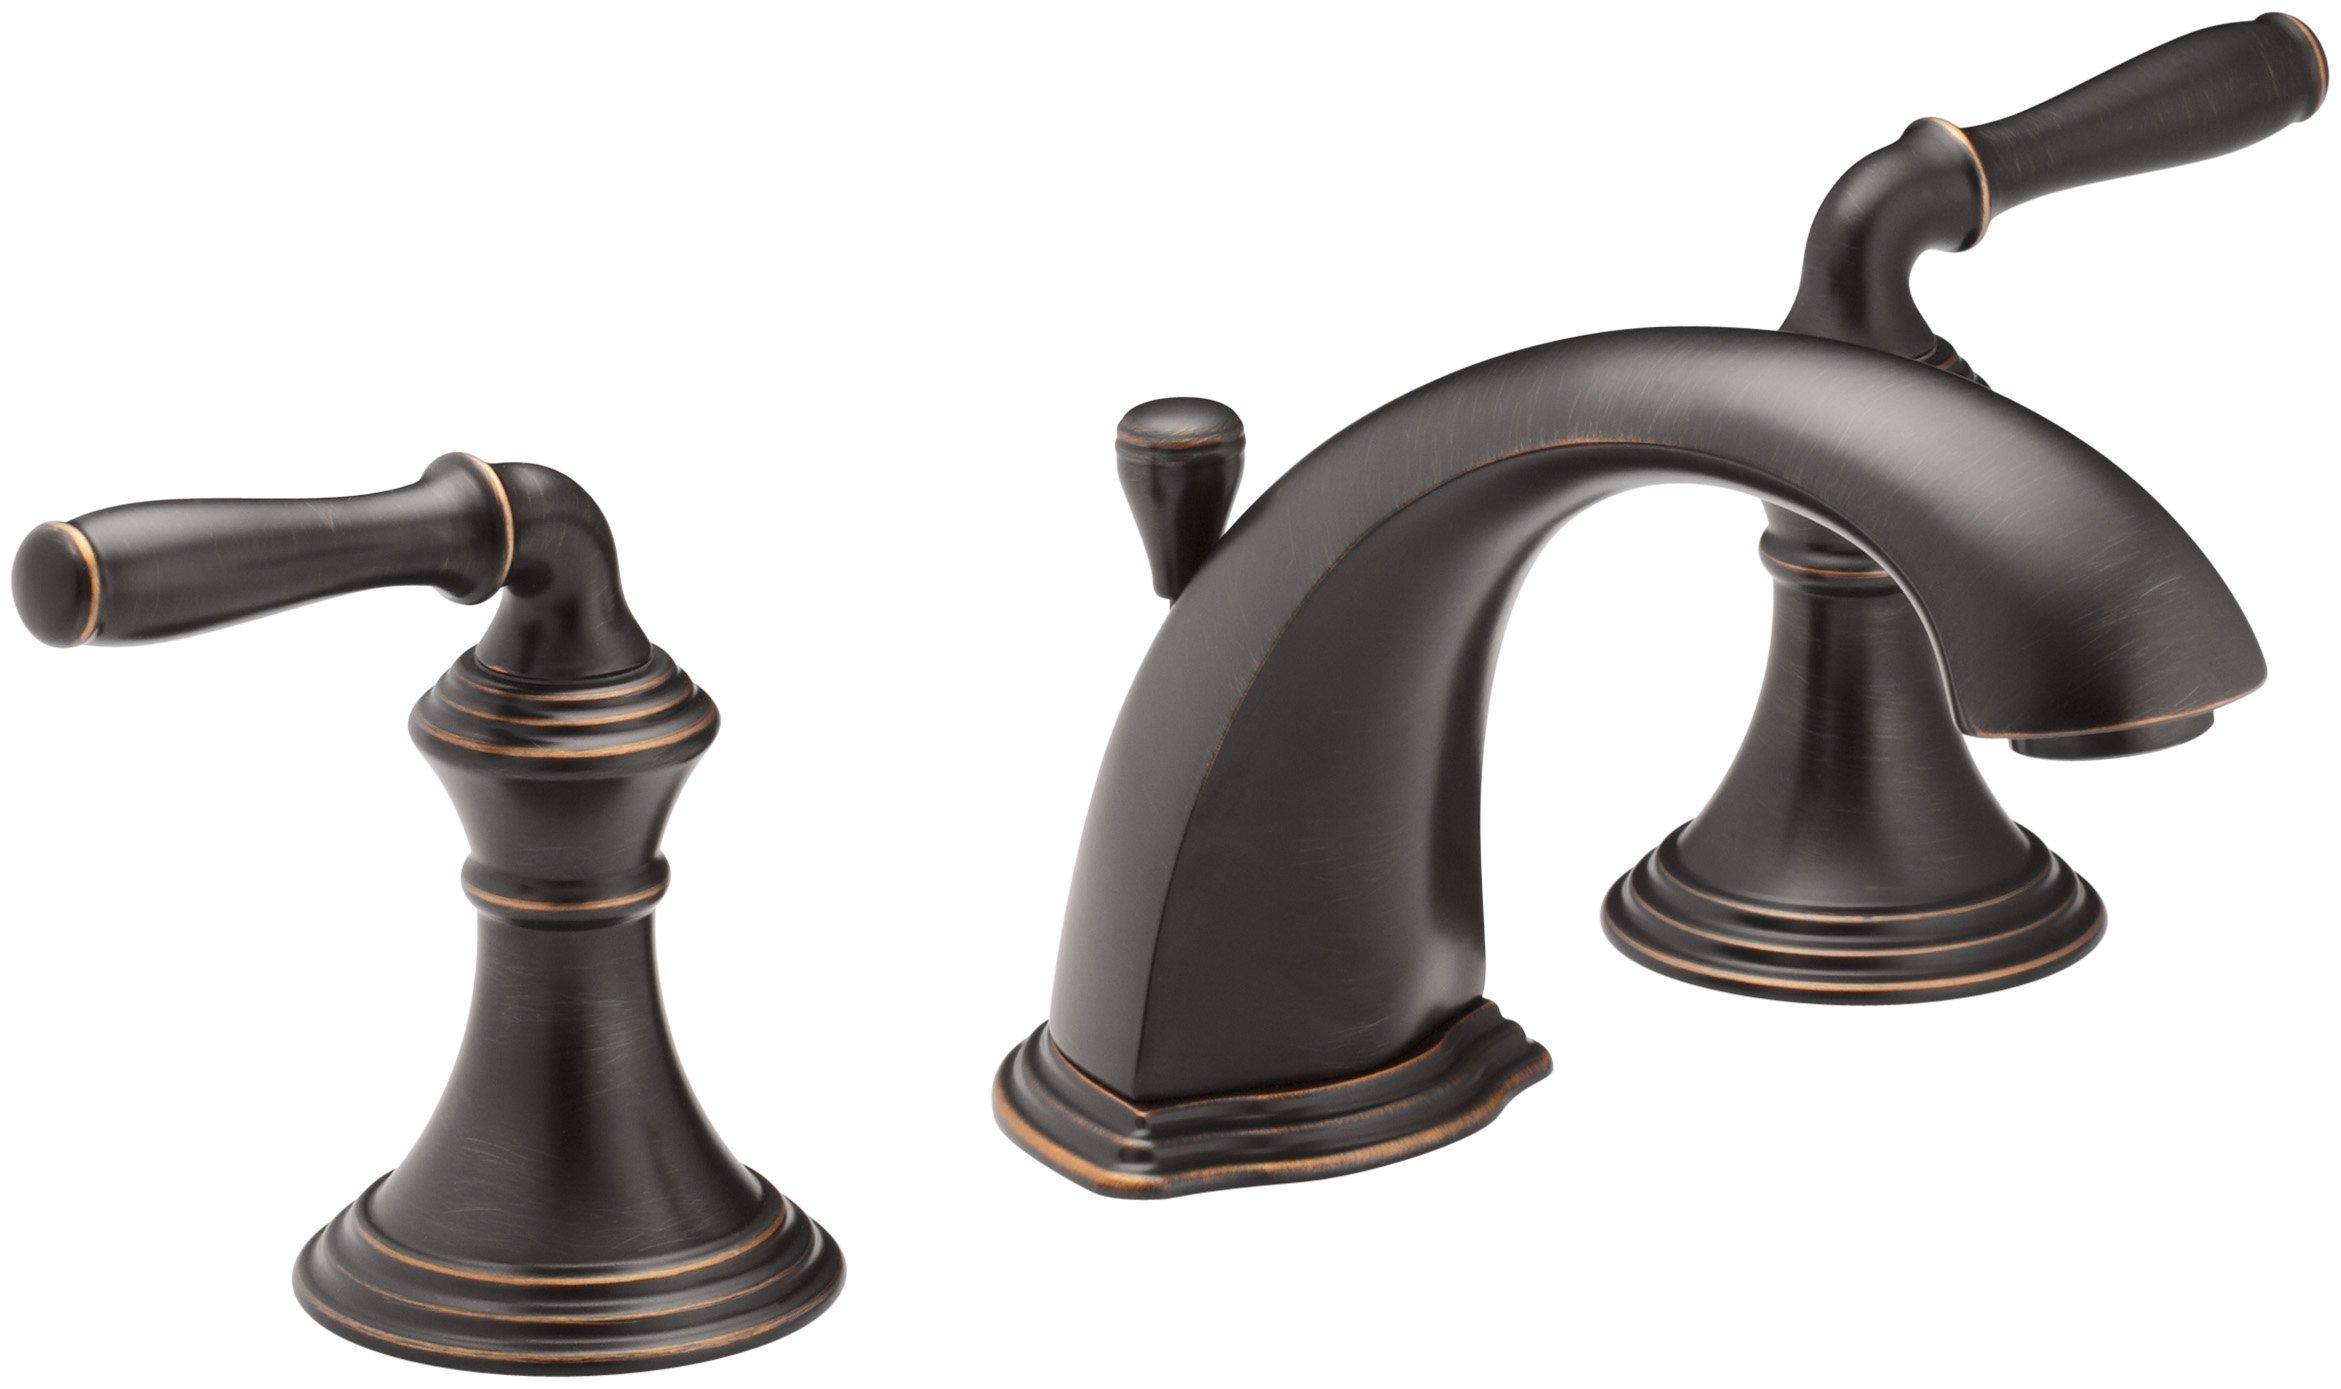 Kohler K-394-4-2BZ Devonshire Two-Handle Widespread Lavatory Faucet, Oil Rubbed Bronze by Kohler